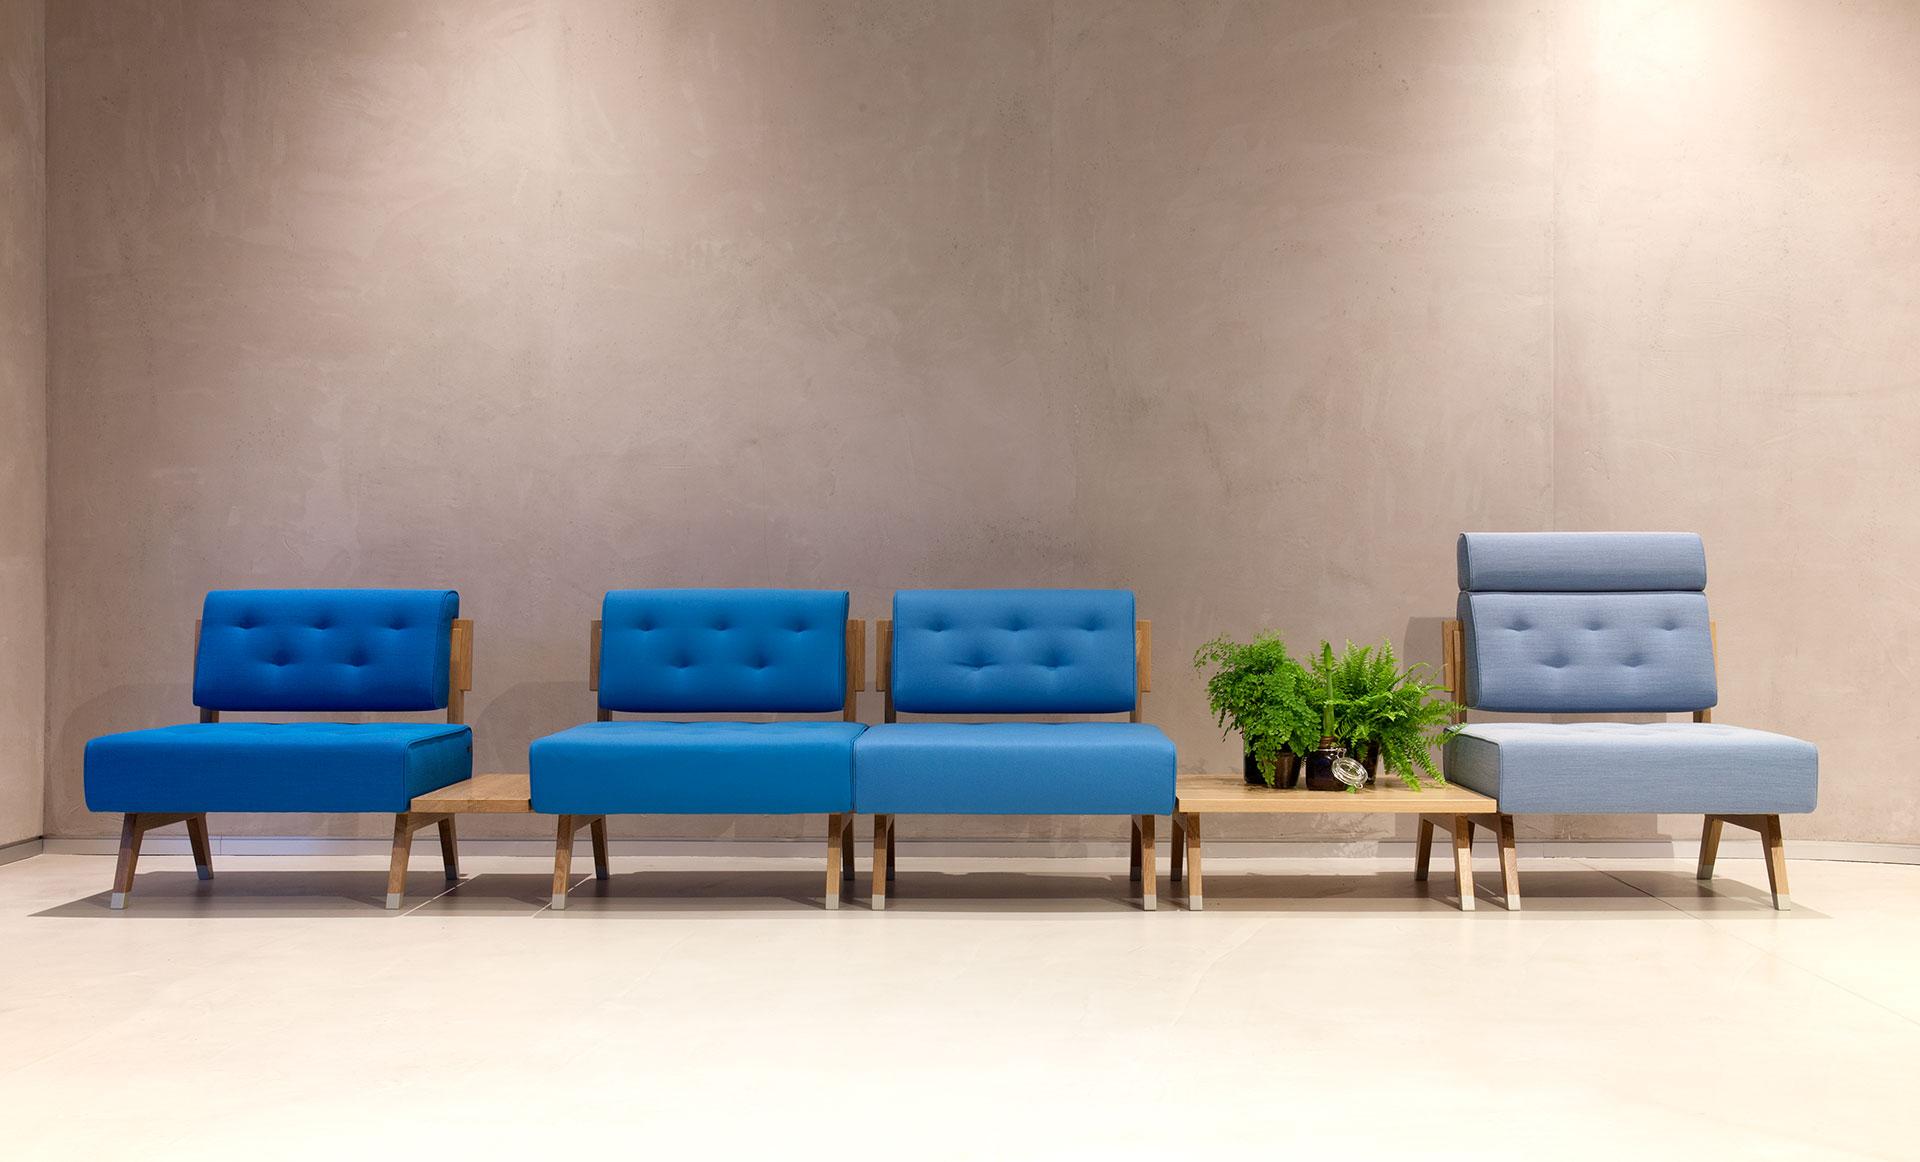 rolf benz furniture. Modular Seating Furniture Rolf Benz 290